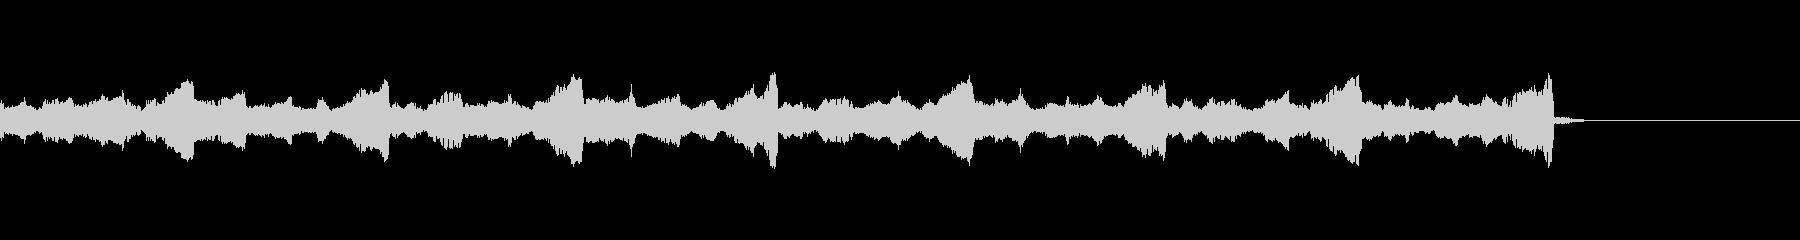 SF的効果音の未再生の波形